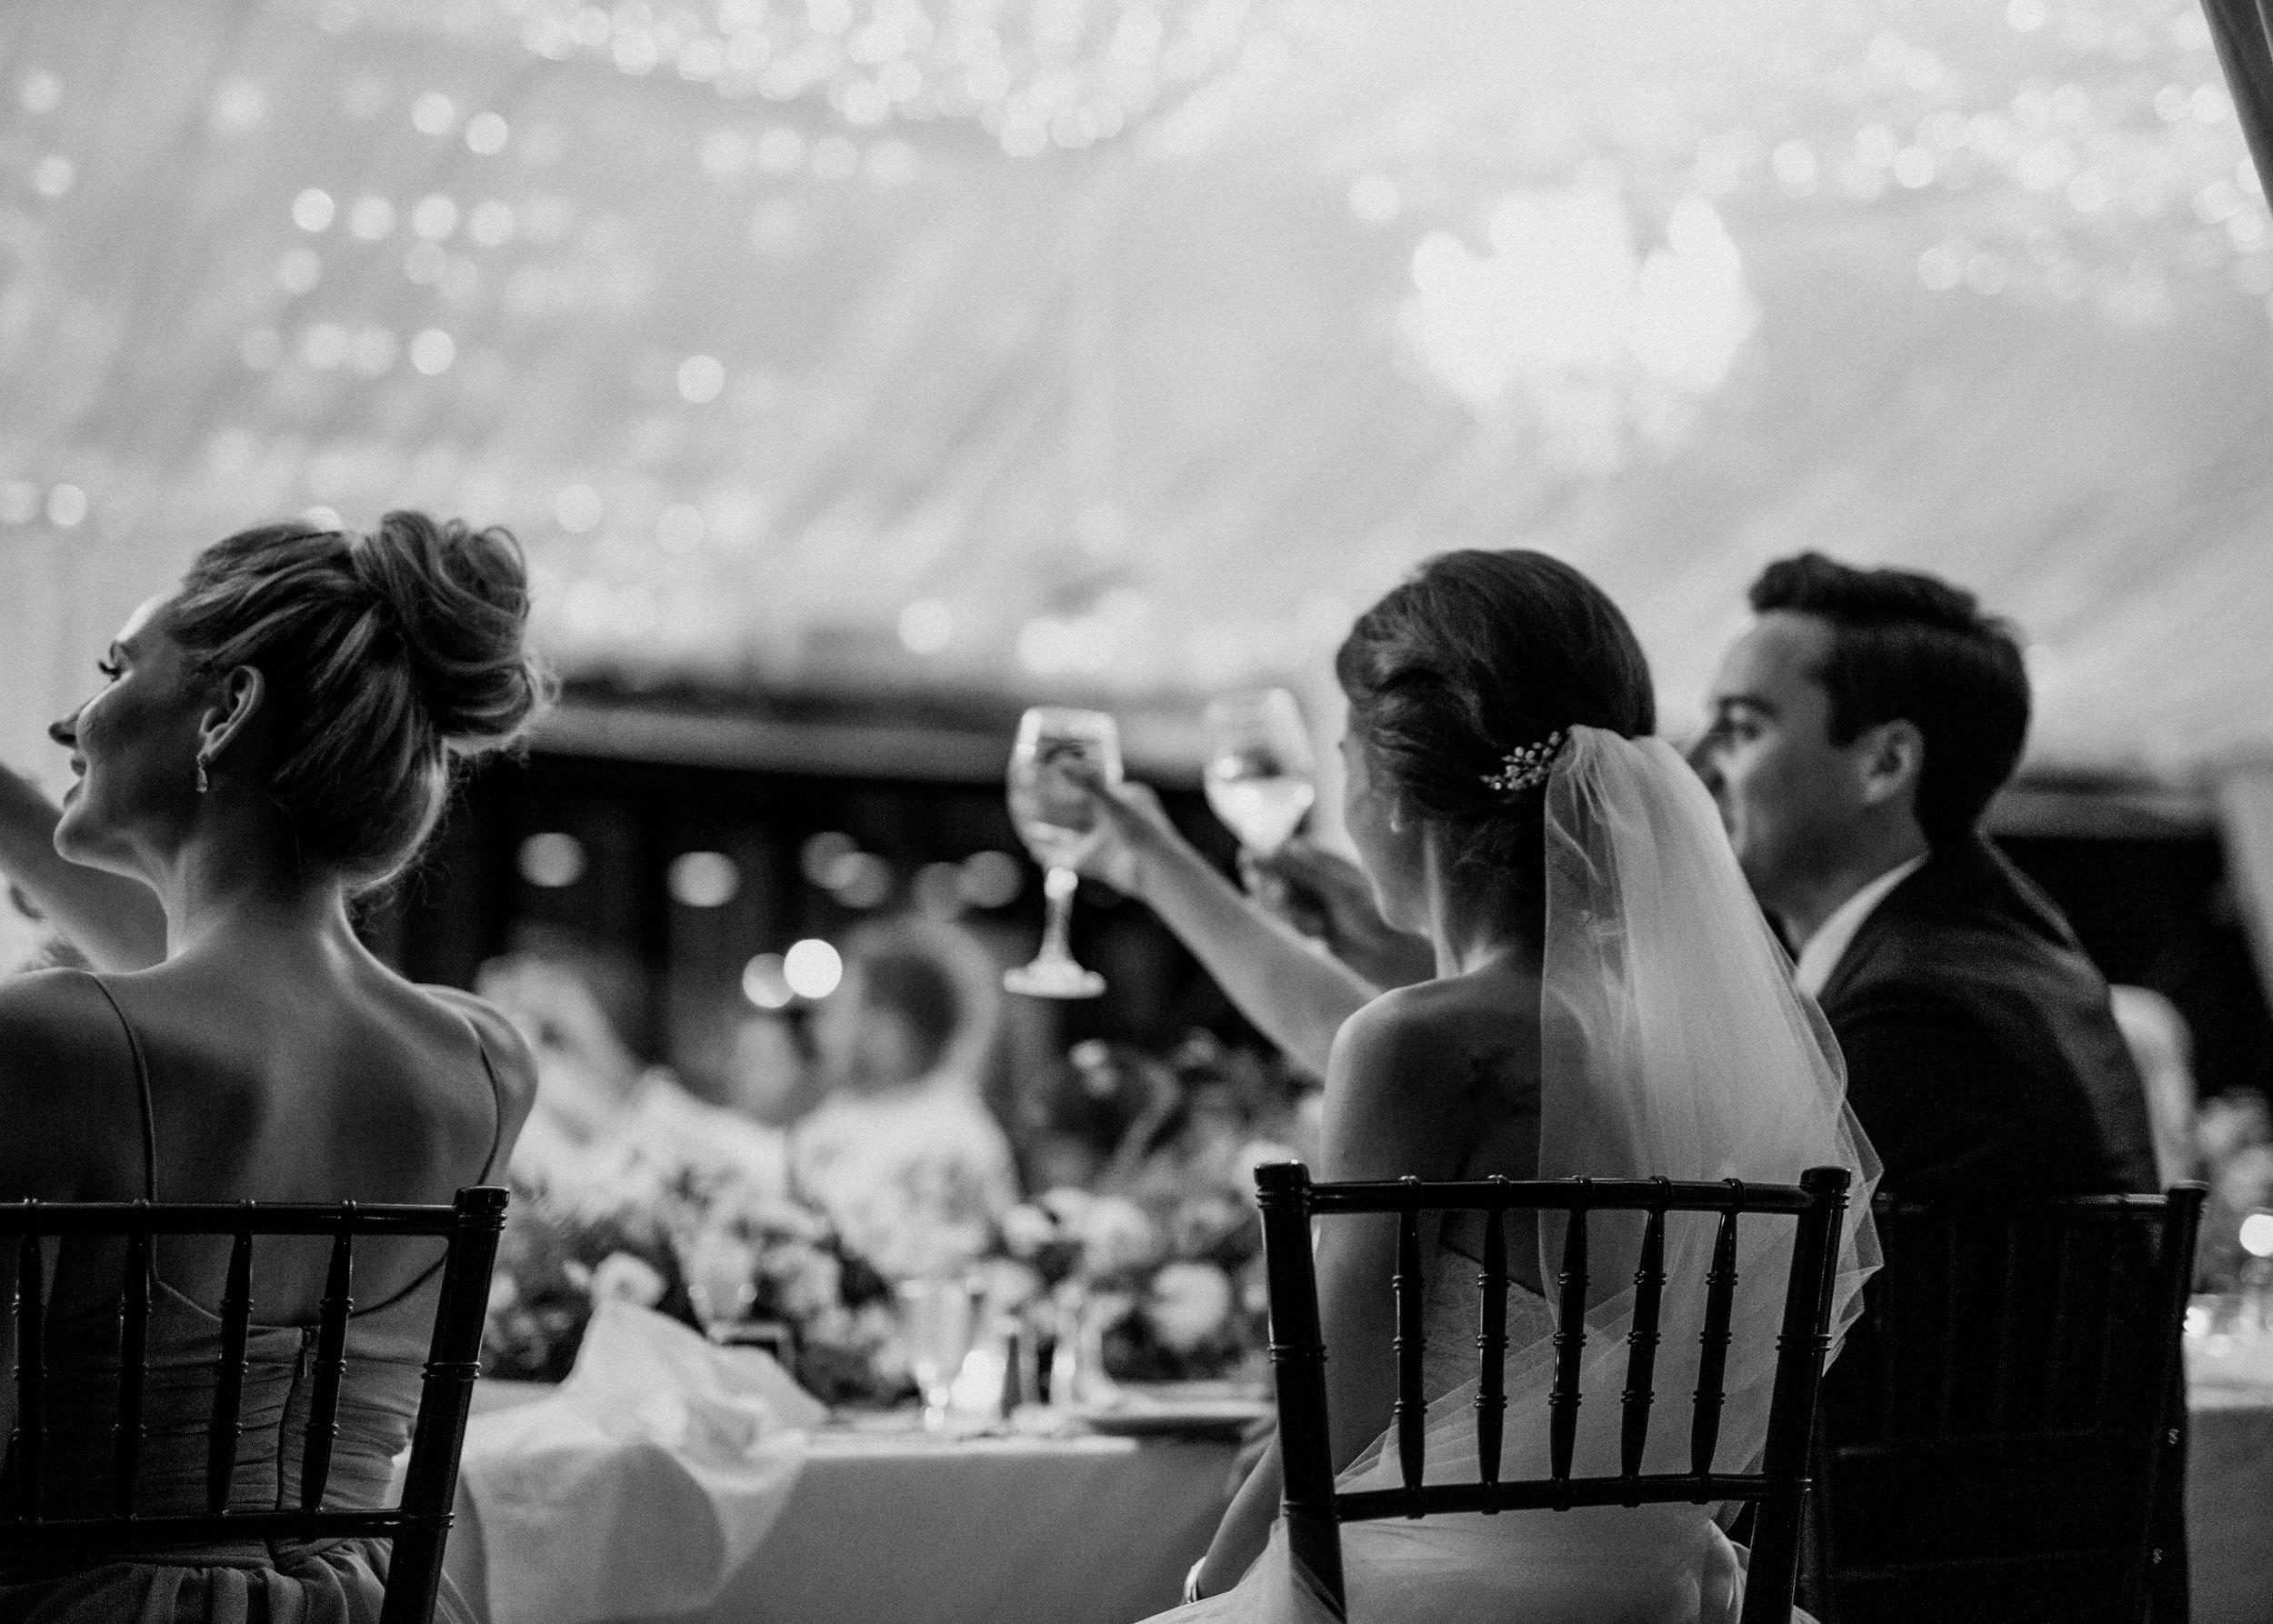 herafilms_carlotta_alex_wedding_hera_highres-64.jpg